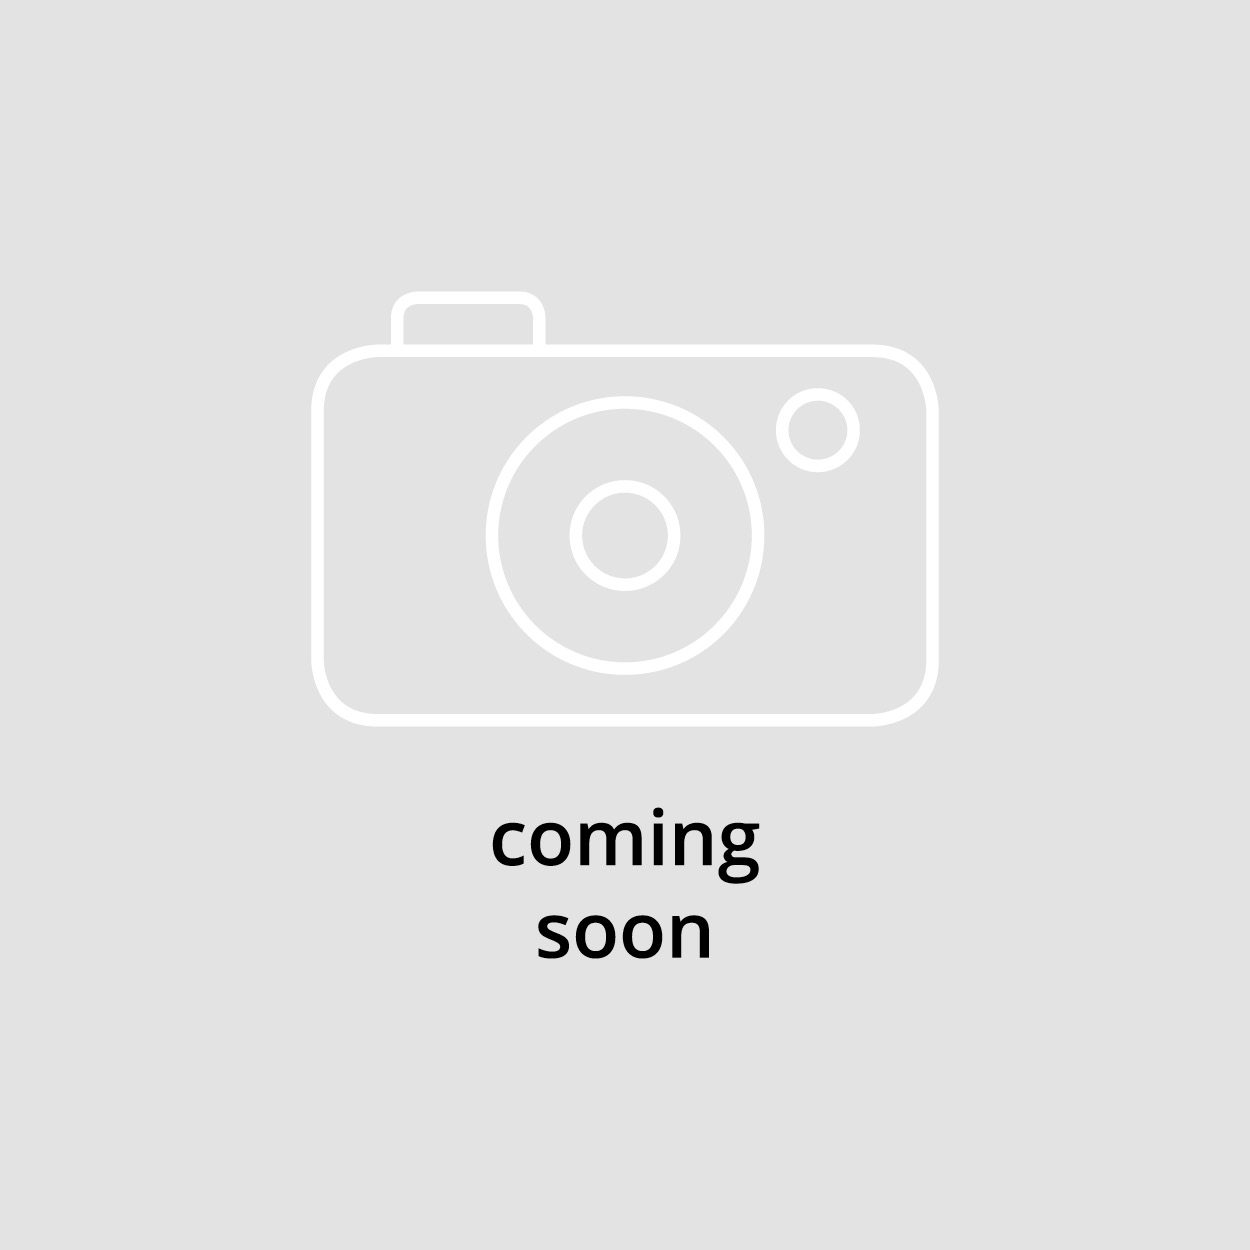 53.01.331 Tirante apertura chiusura pinza arresto mandrino per Gildemesiter GM16AC